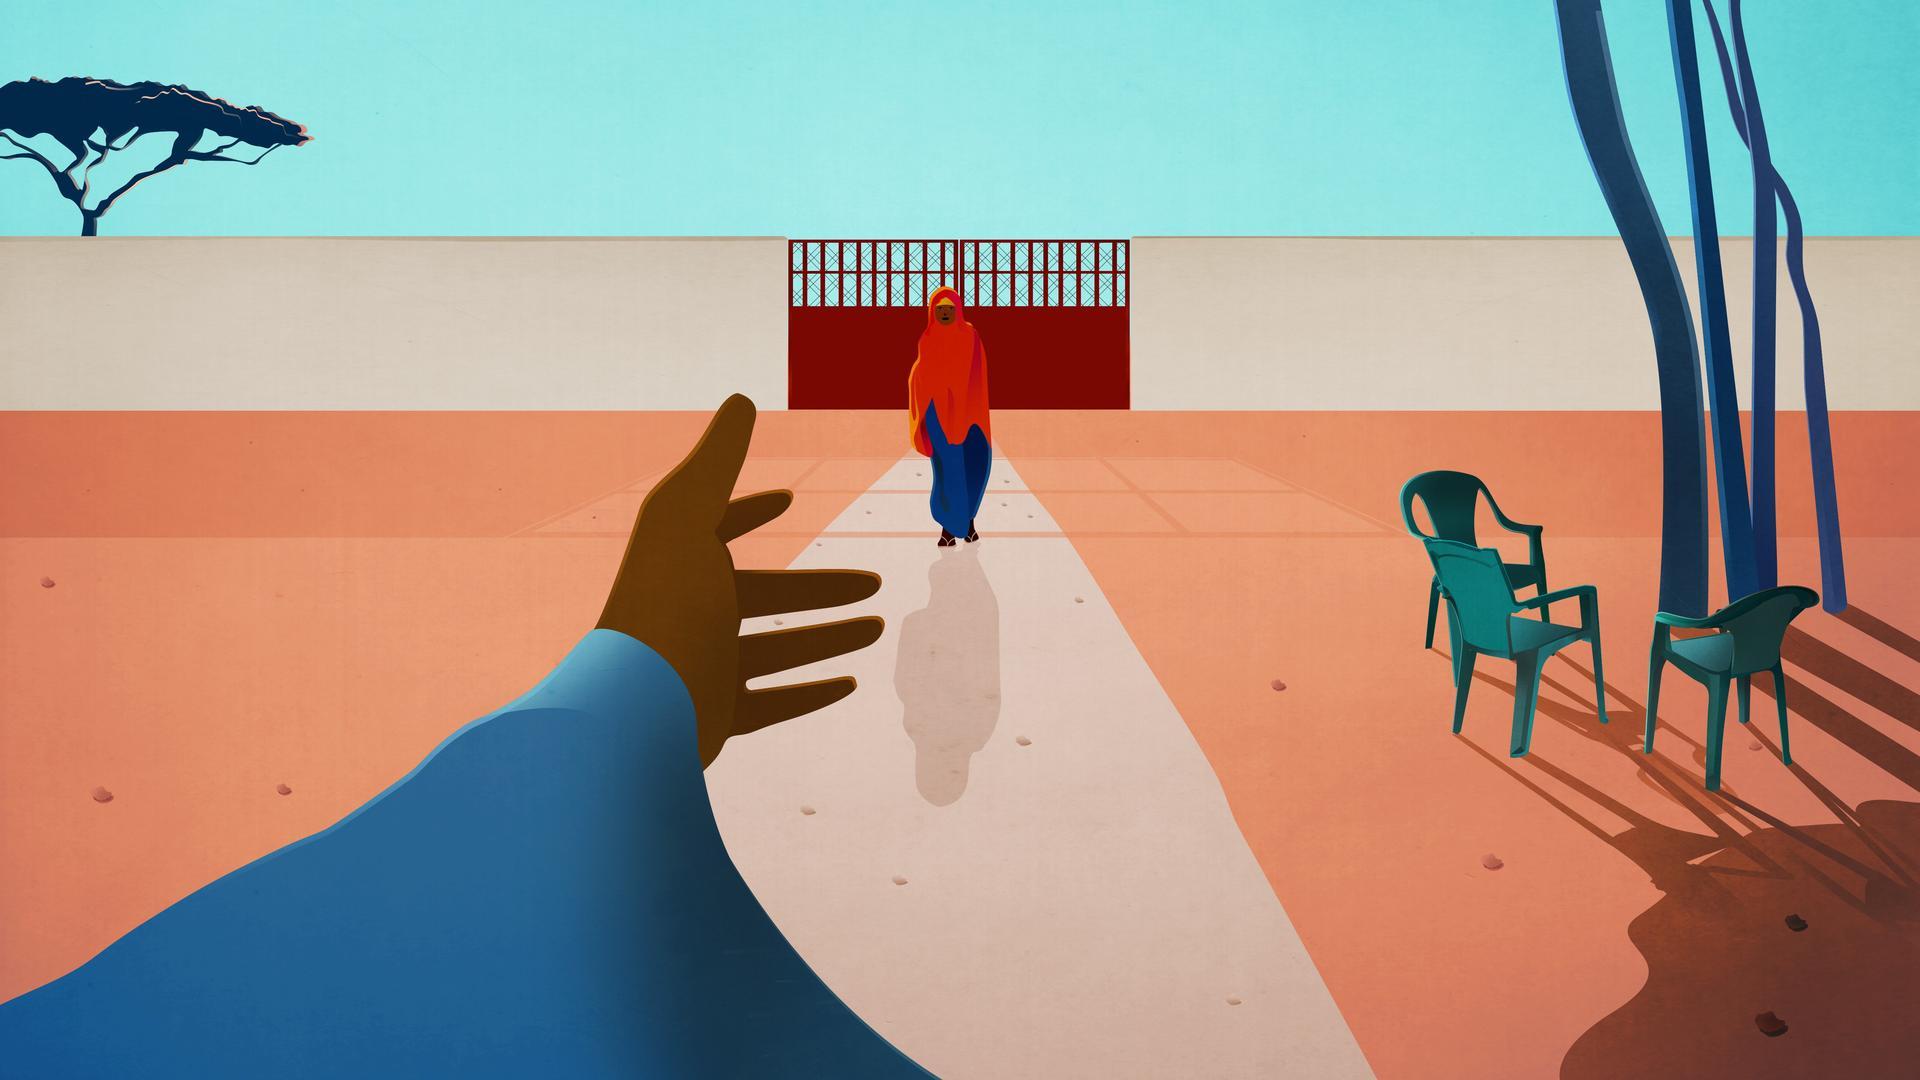 Private violence, public concern: Intimate partner violence